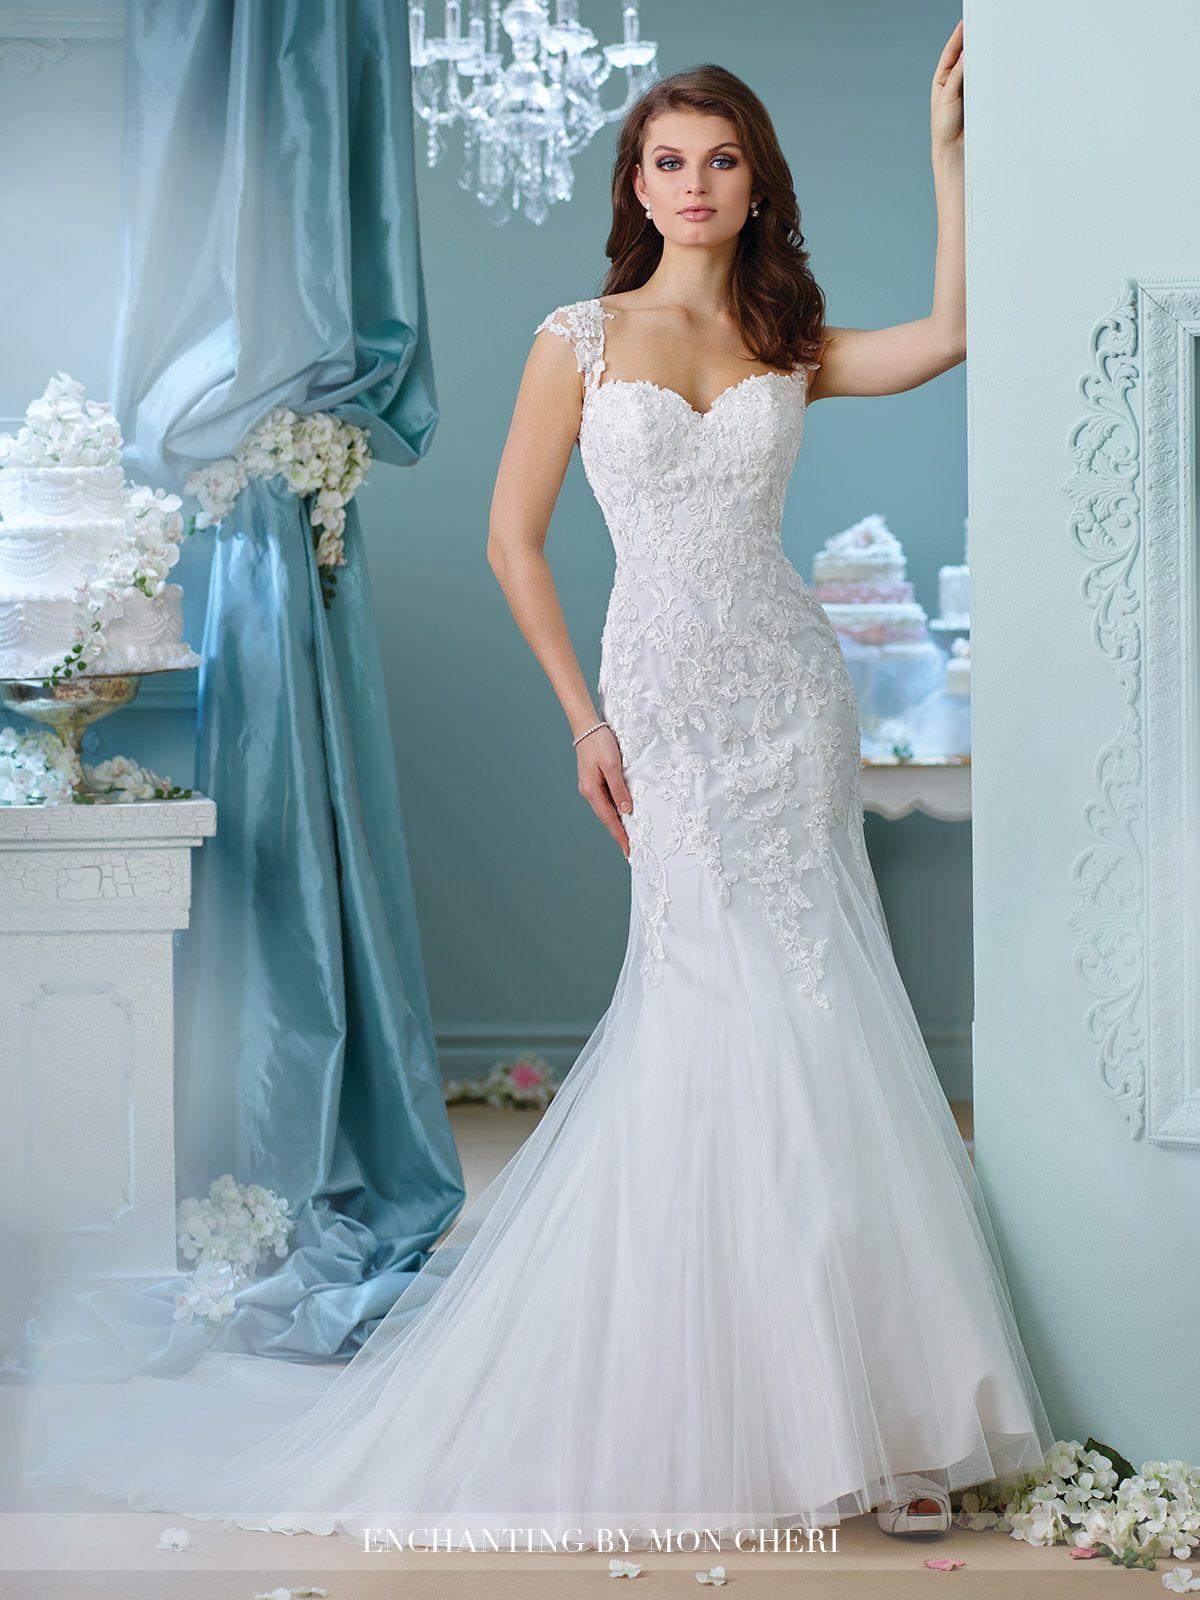 Lace Cap Sleeve Wedding Dress- 216156- Enchanting by Mon Cheri ...